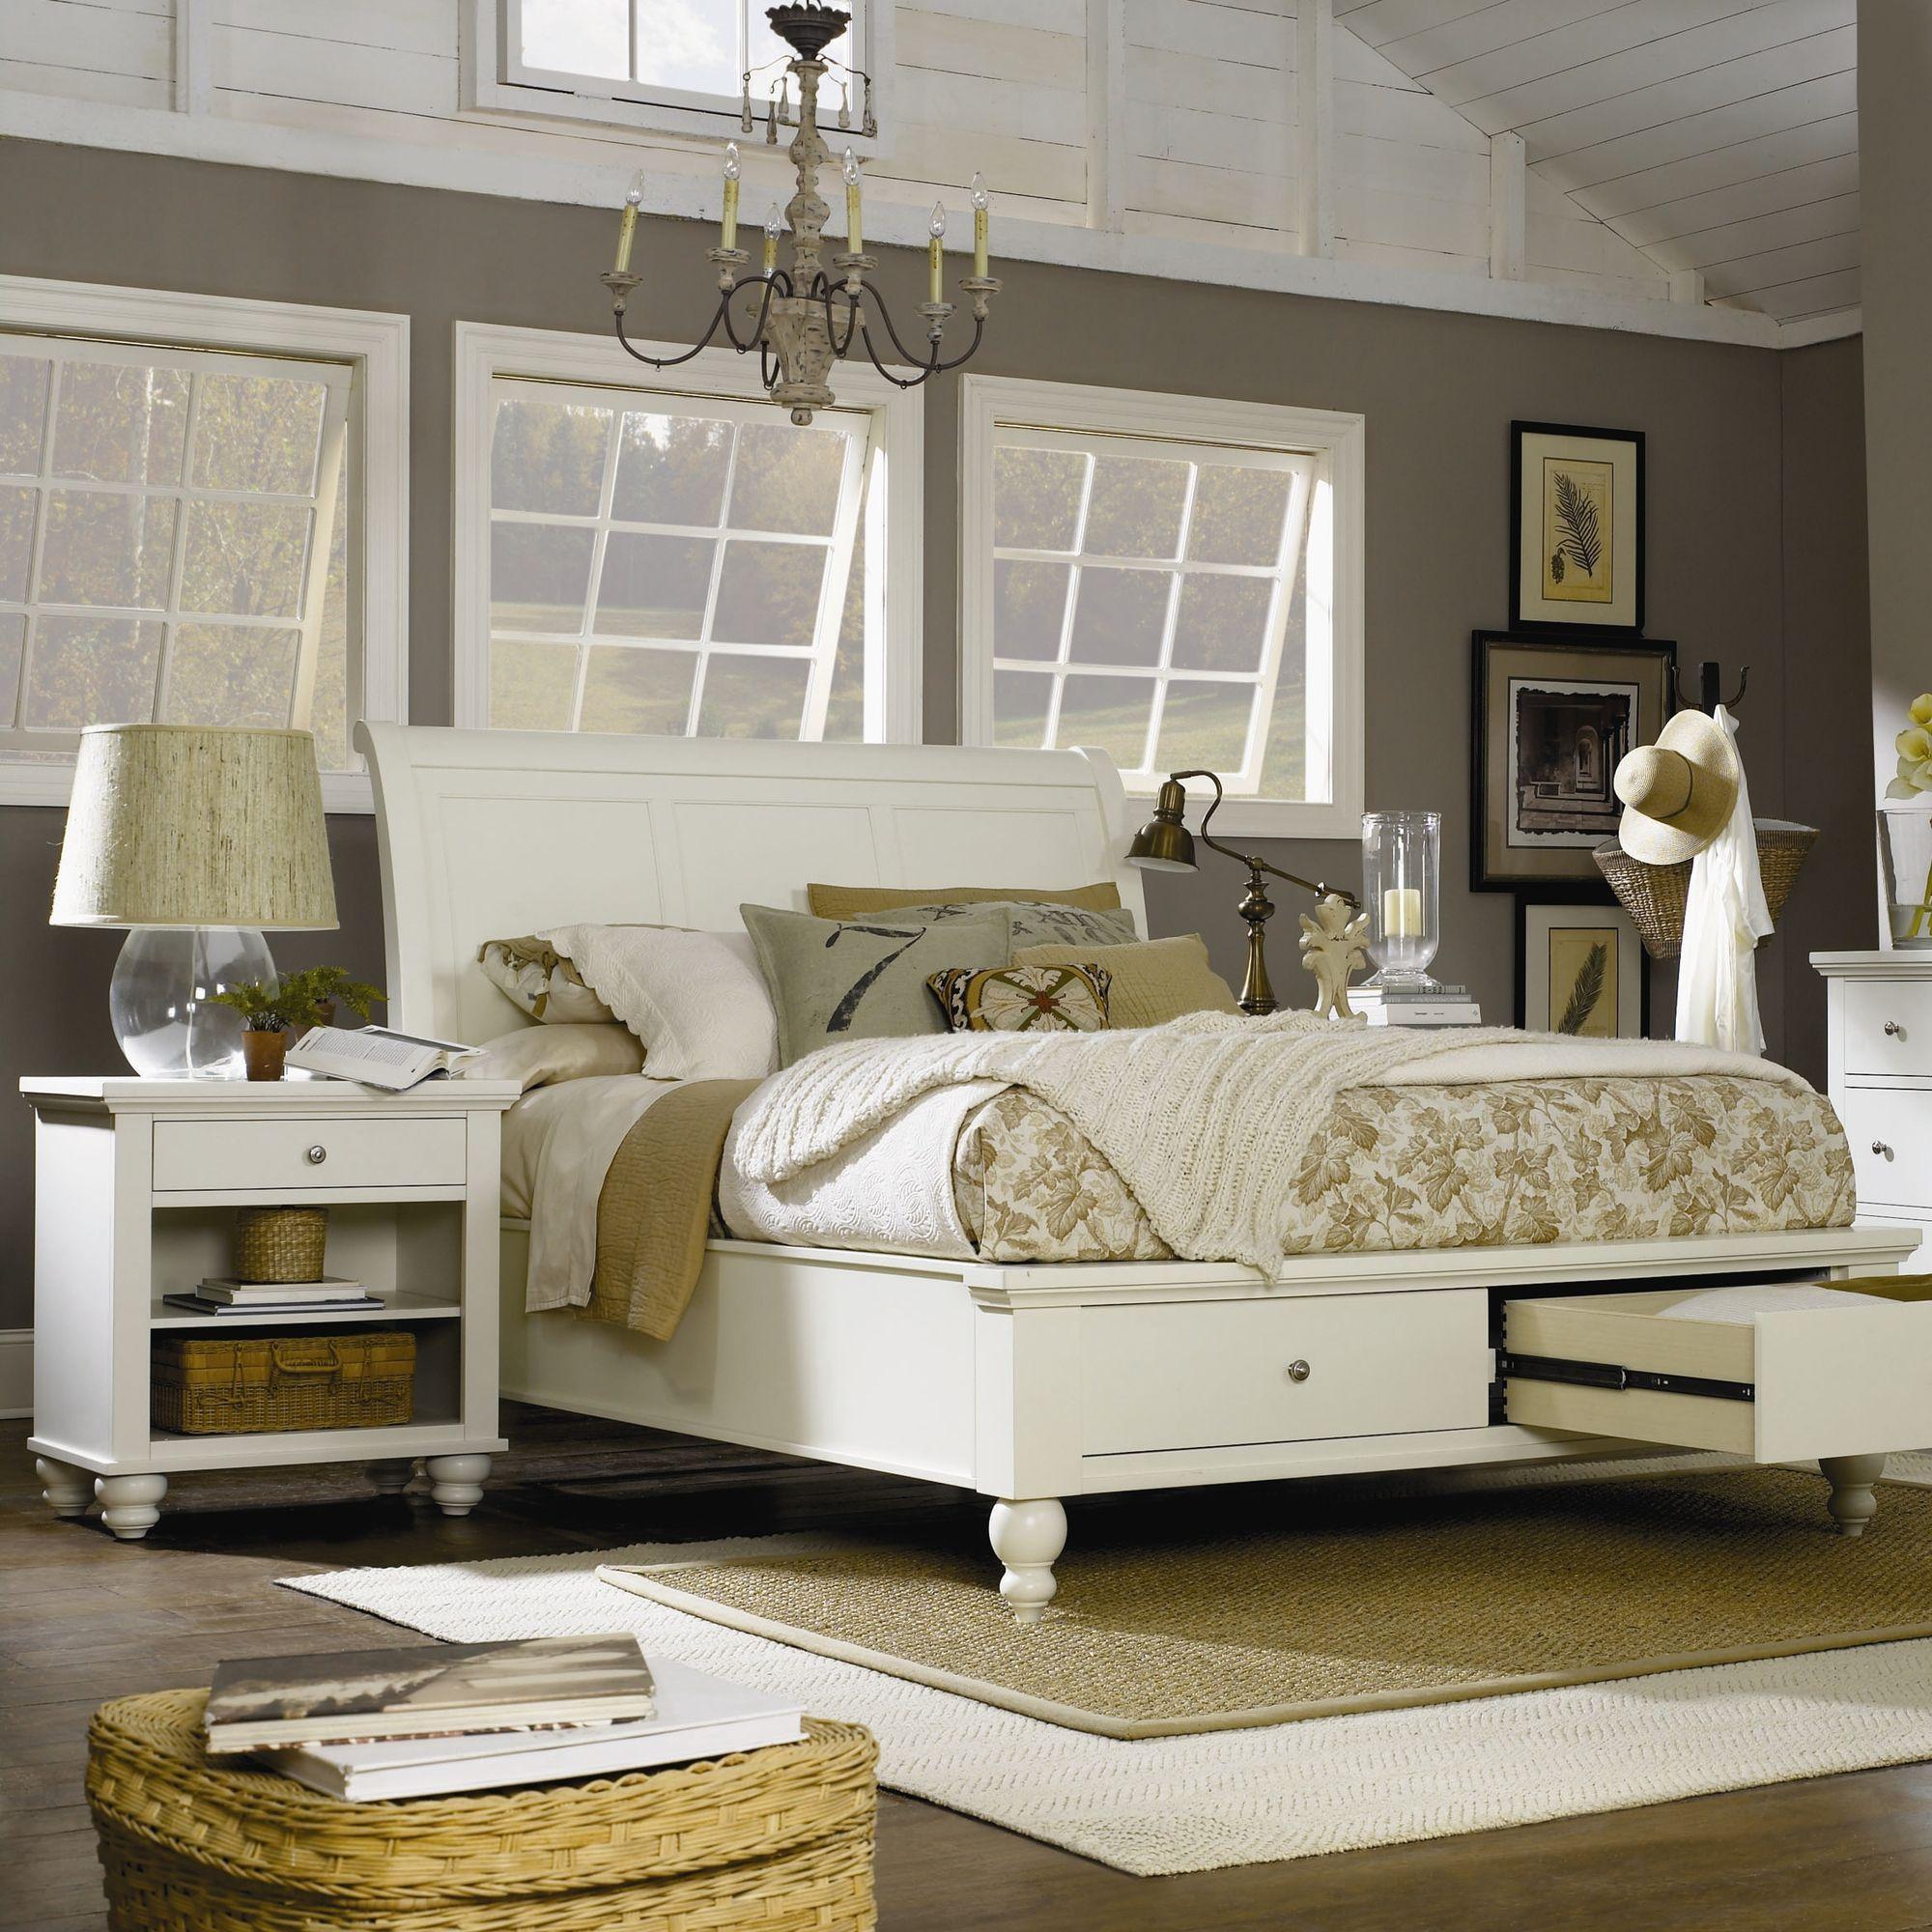 lansford park kingston storage bedroom set in eggshell white chambre ensembles de chambre king